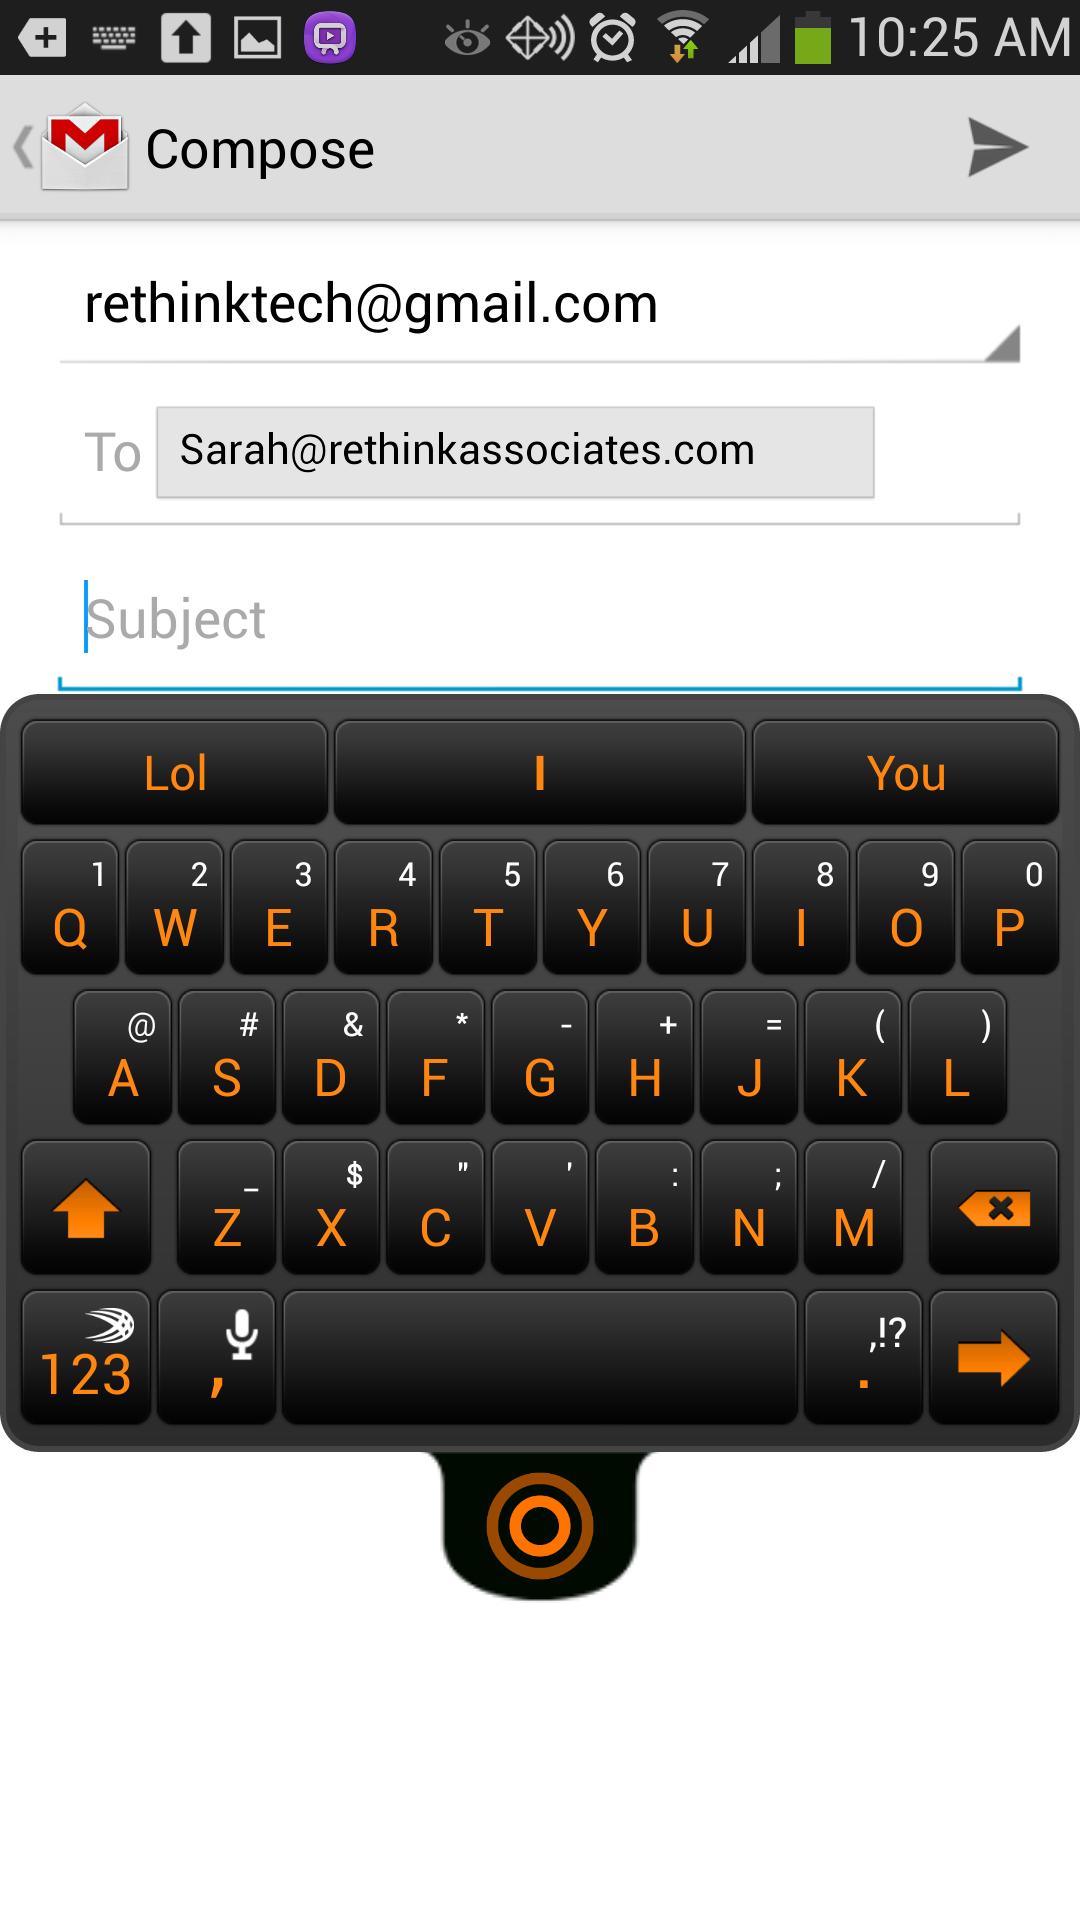 Screenshot_2013-10-17-10-25-34.png